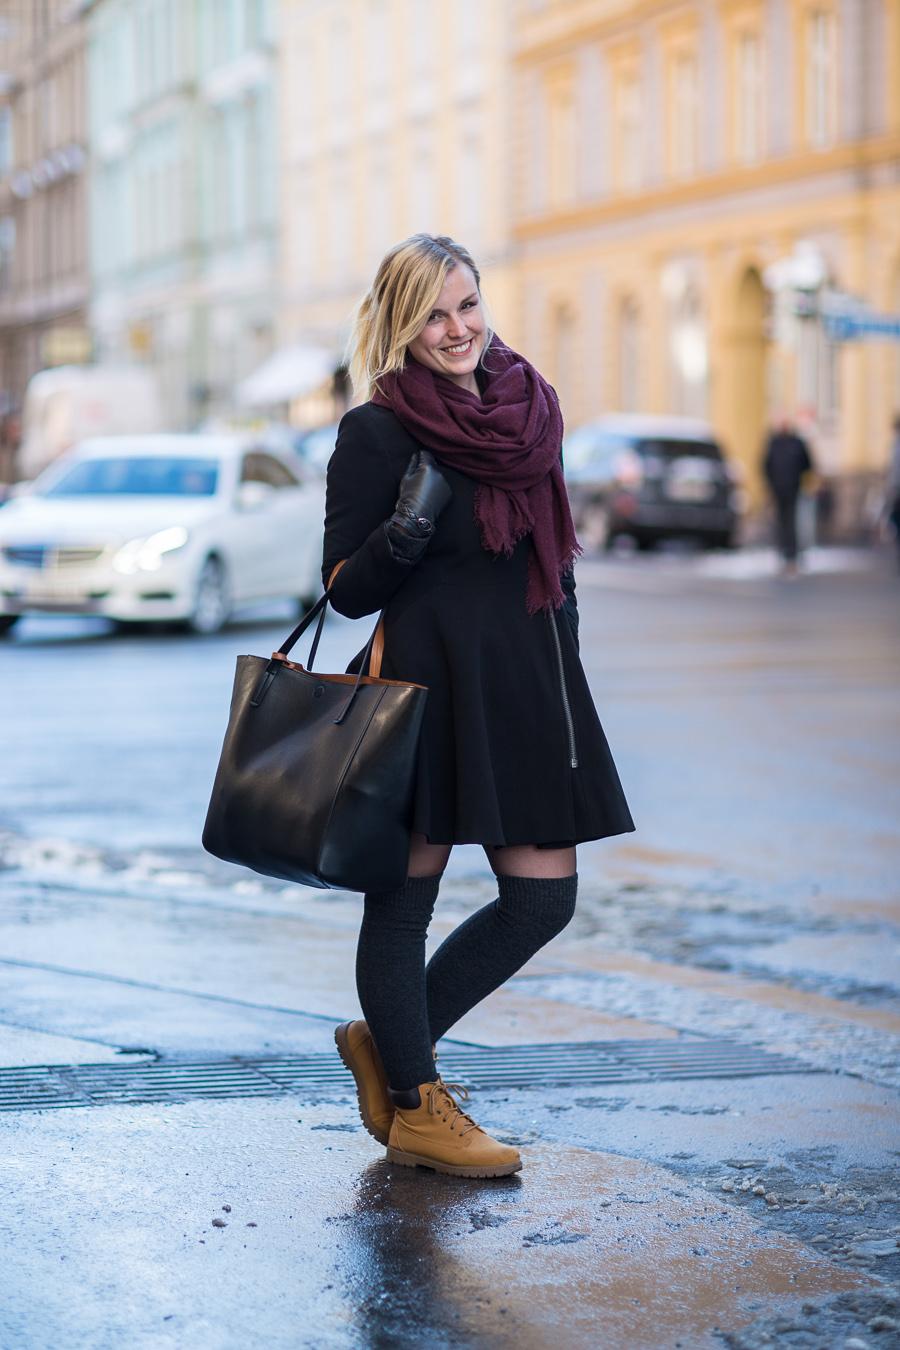 street-style-fashion-blog-innsbruck-verena